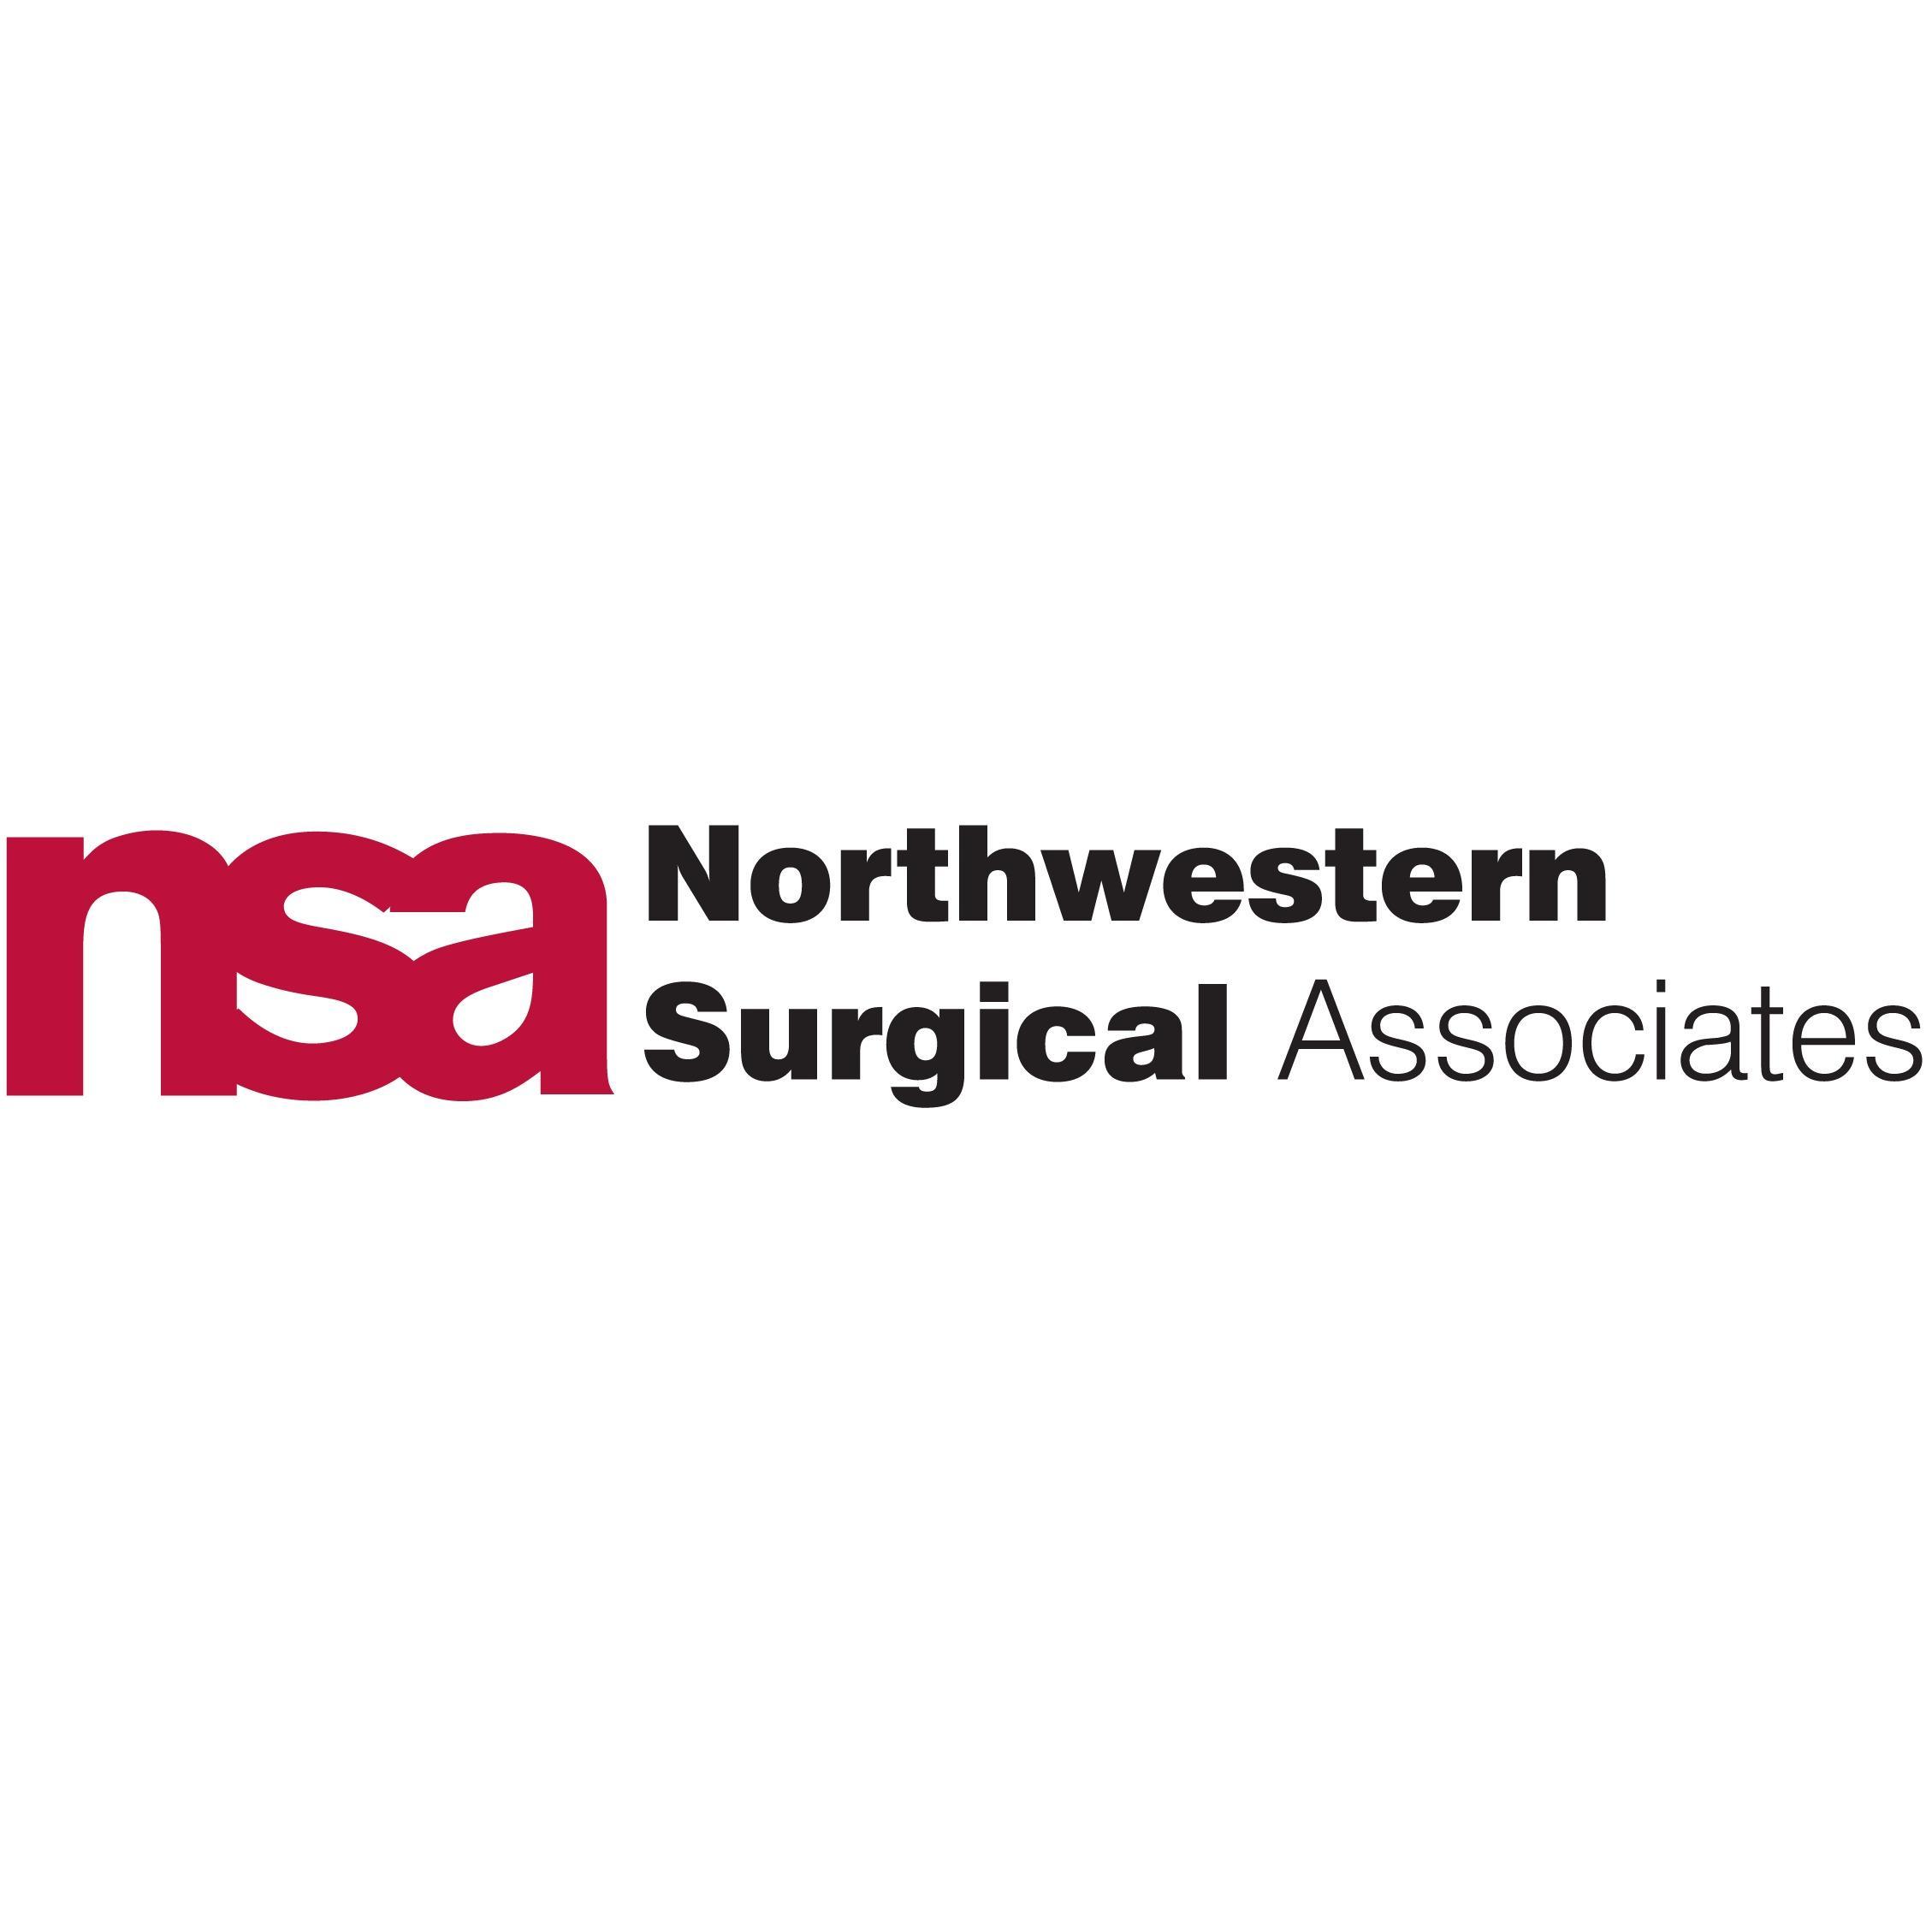 Northwestern Surgical Associates - Chicago, IL 60611 - (312)274-1811 | ShowMeLocal.com